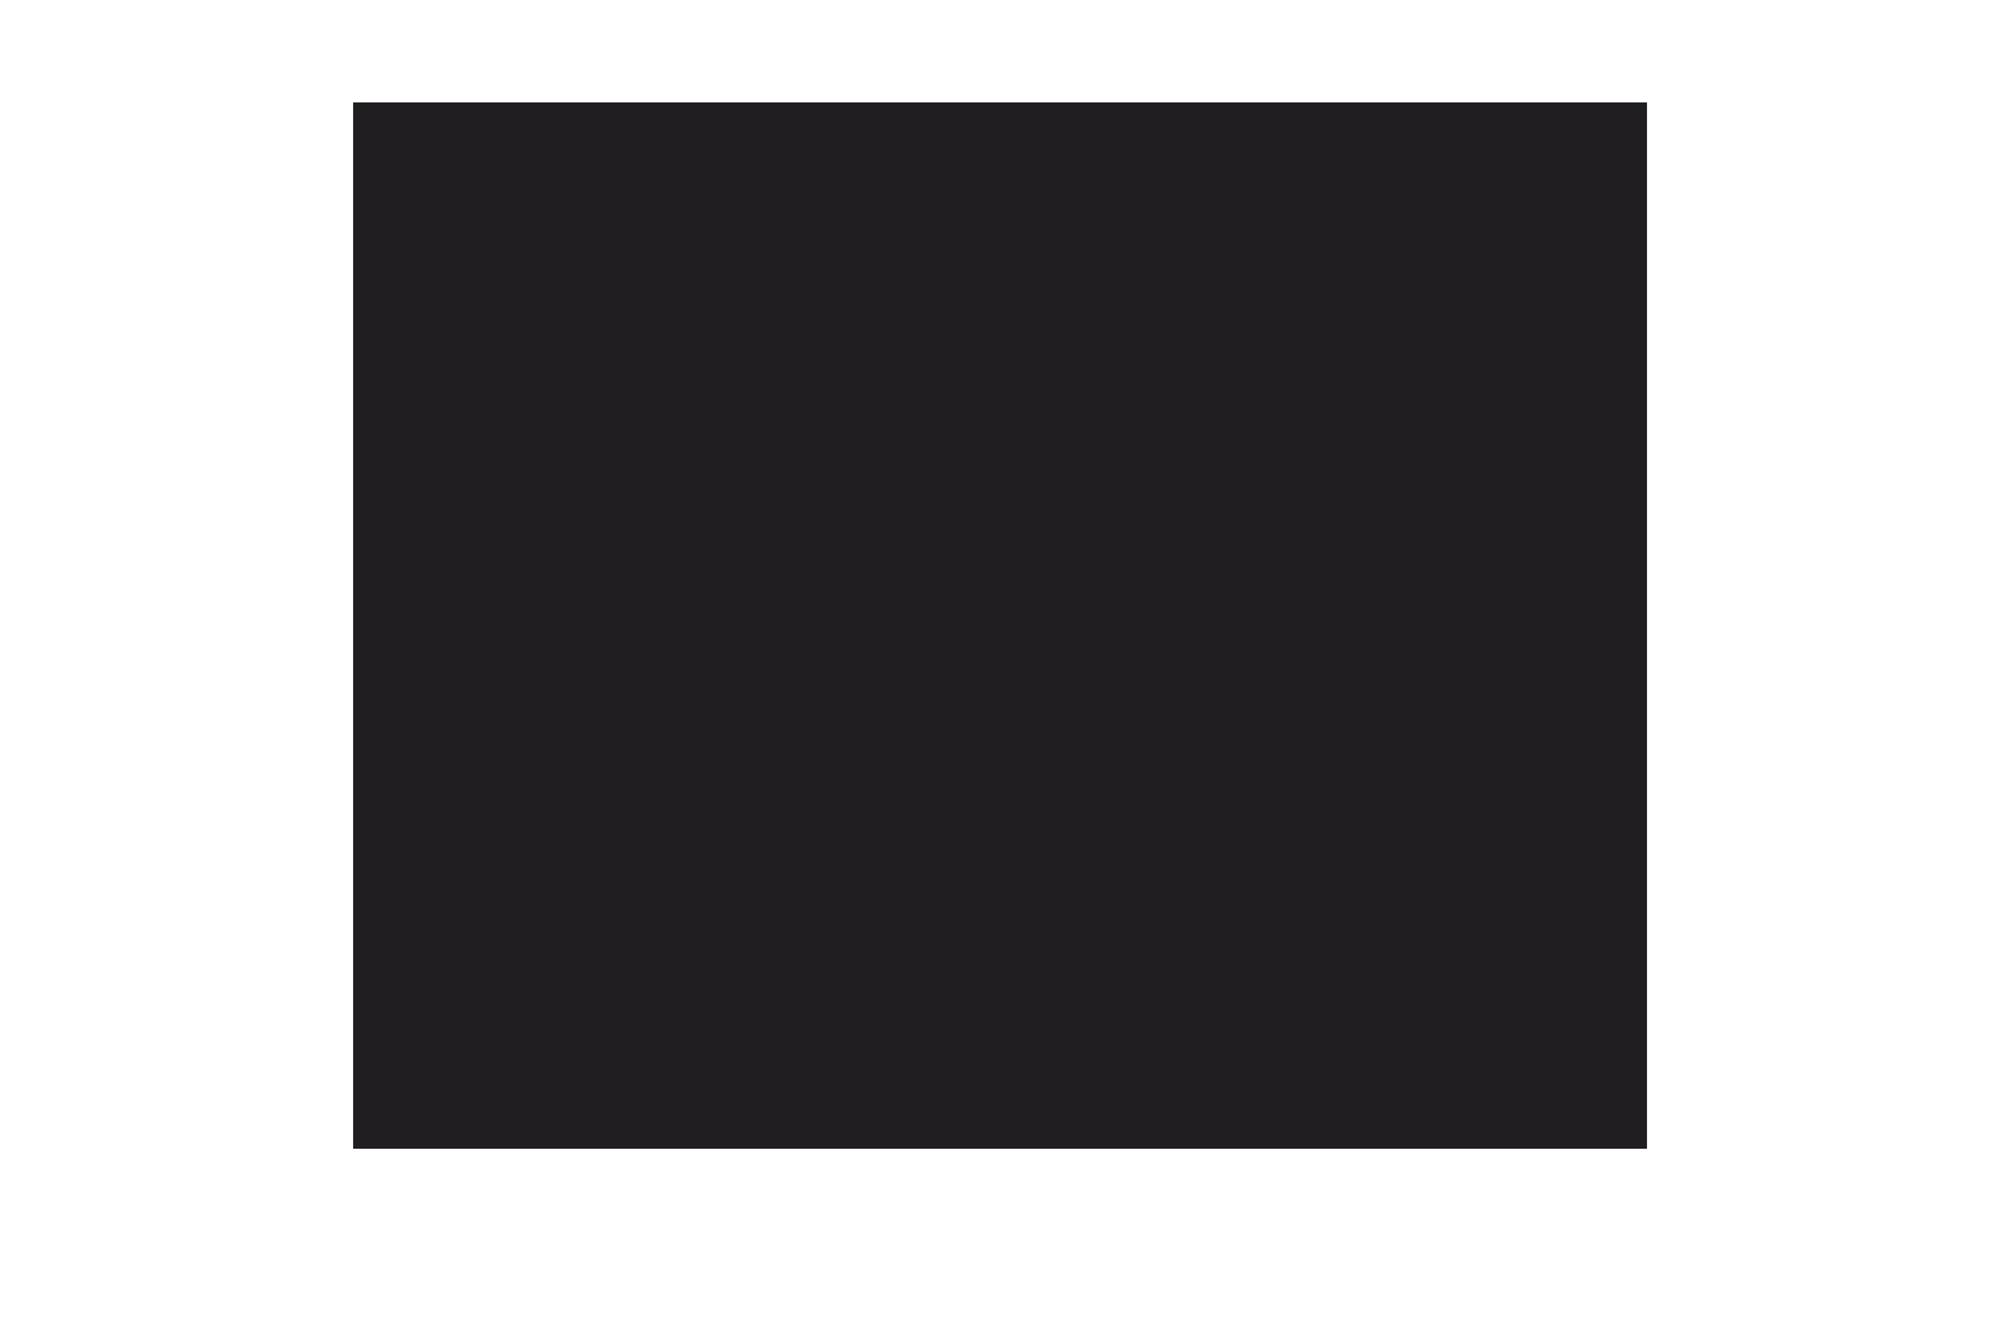 Lucas de Staël - MINOTAURE, M04 C02